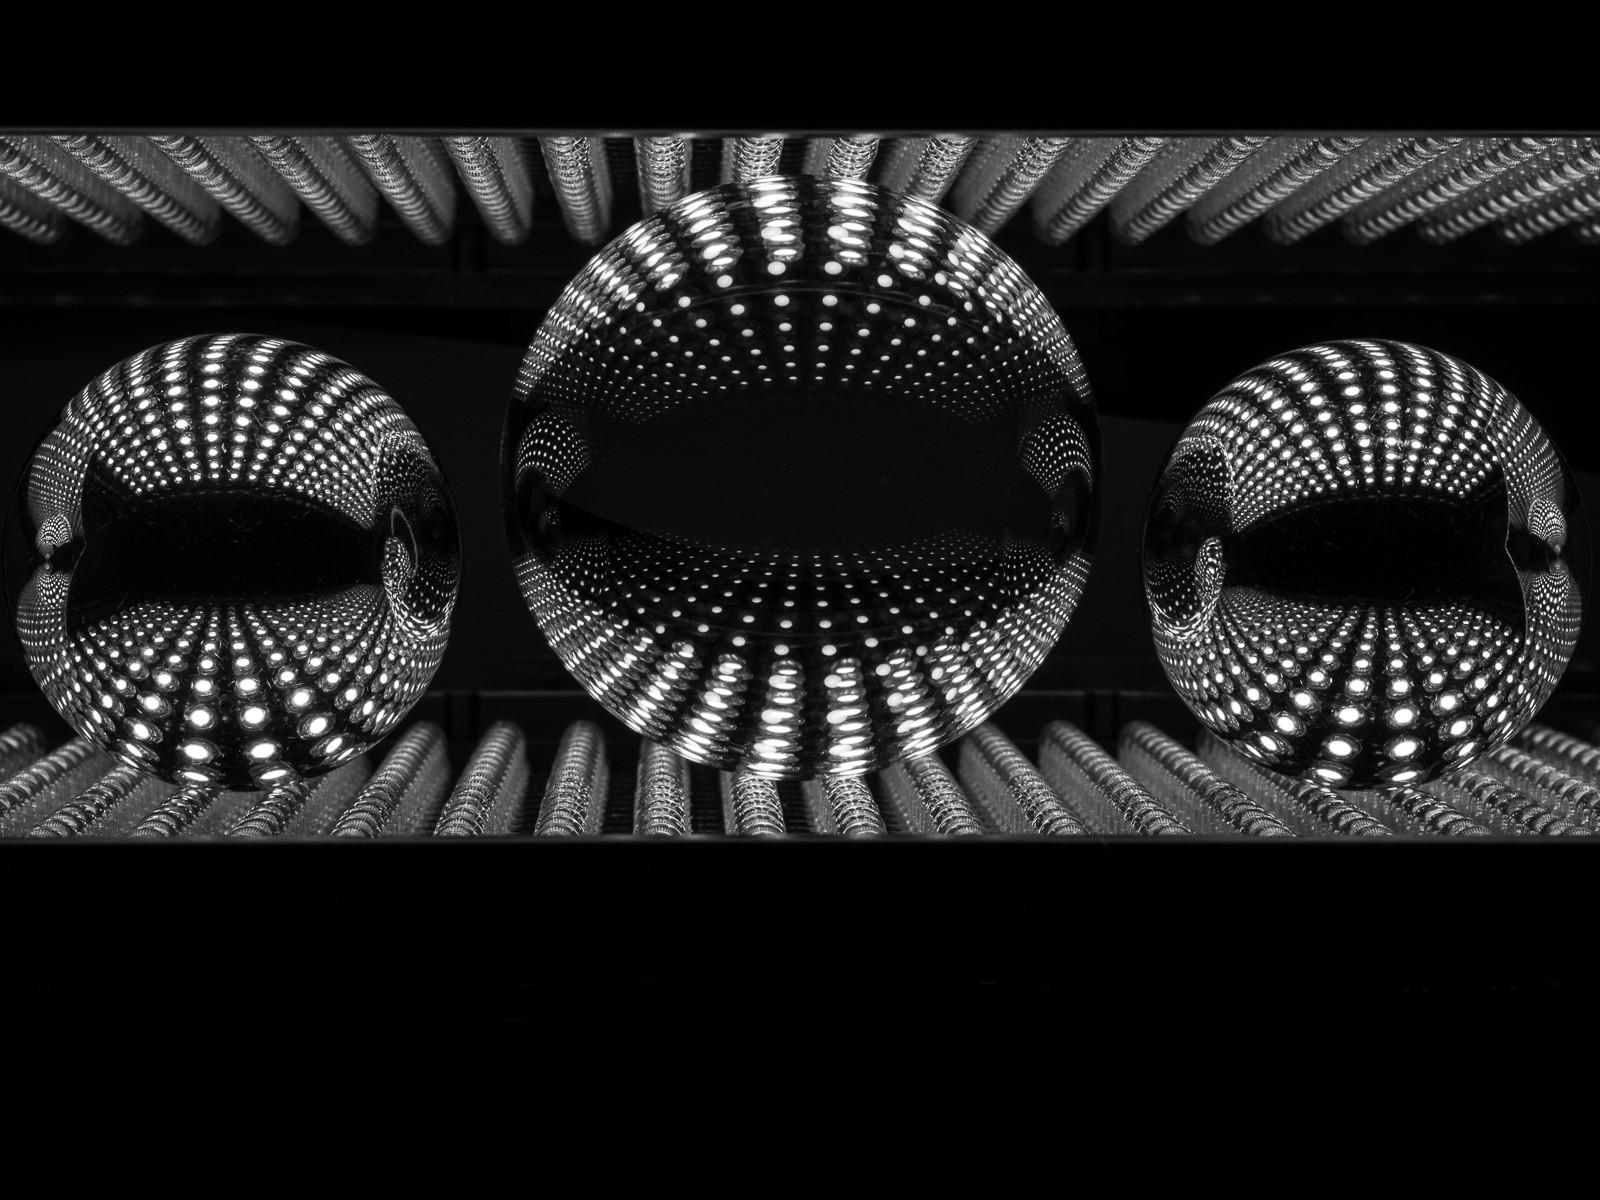 PDI - Crystal Ball Reflections by Steve Stewart (10 marks)